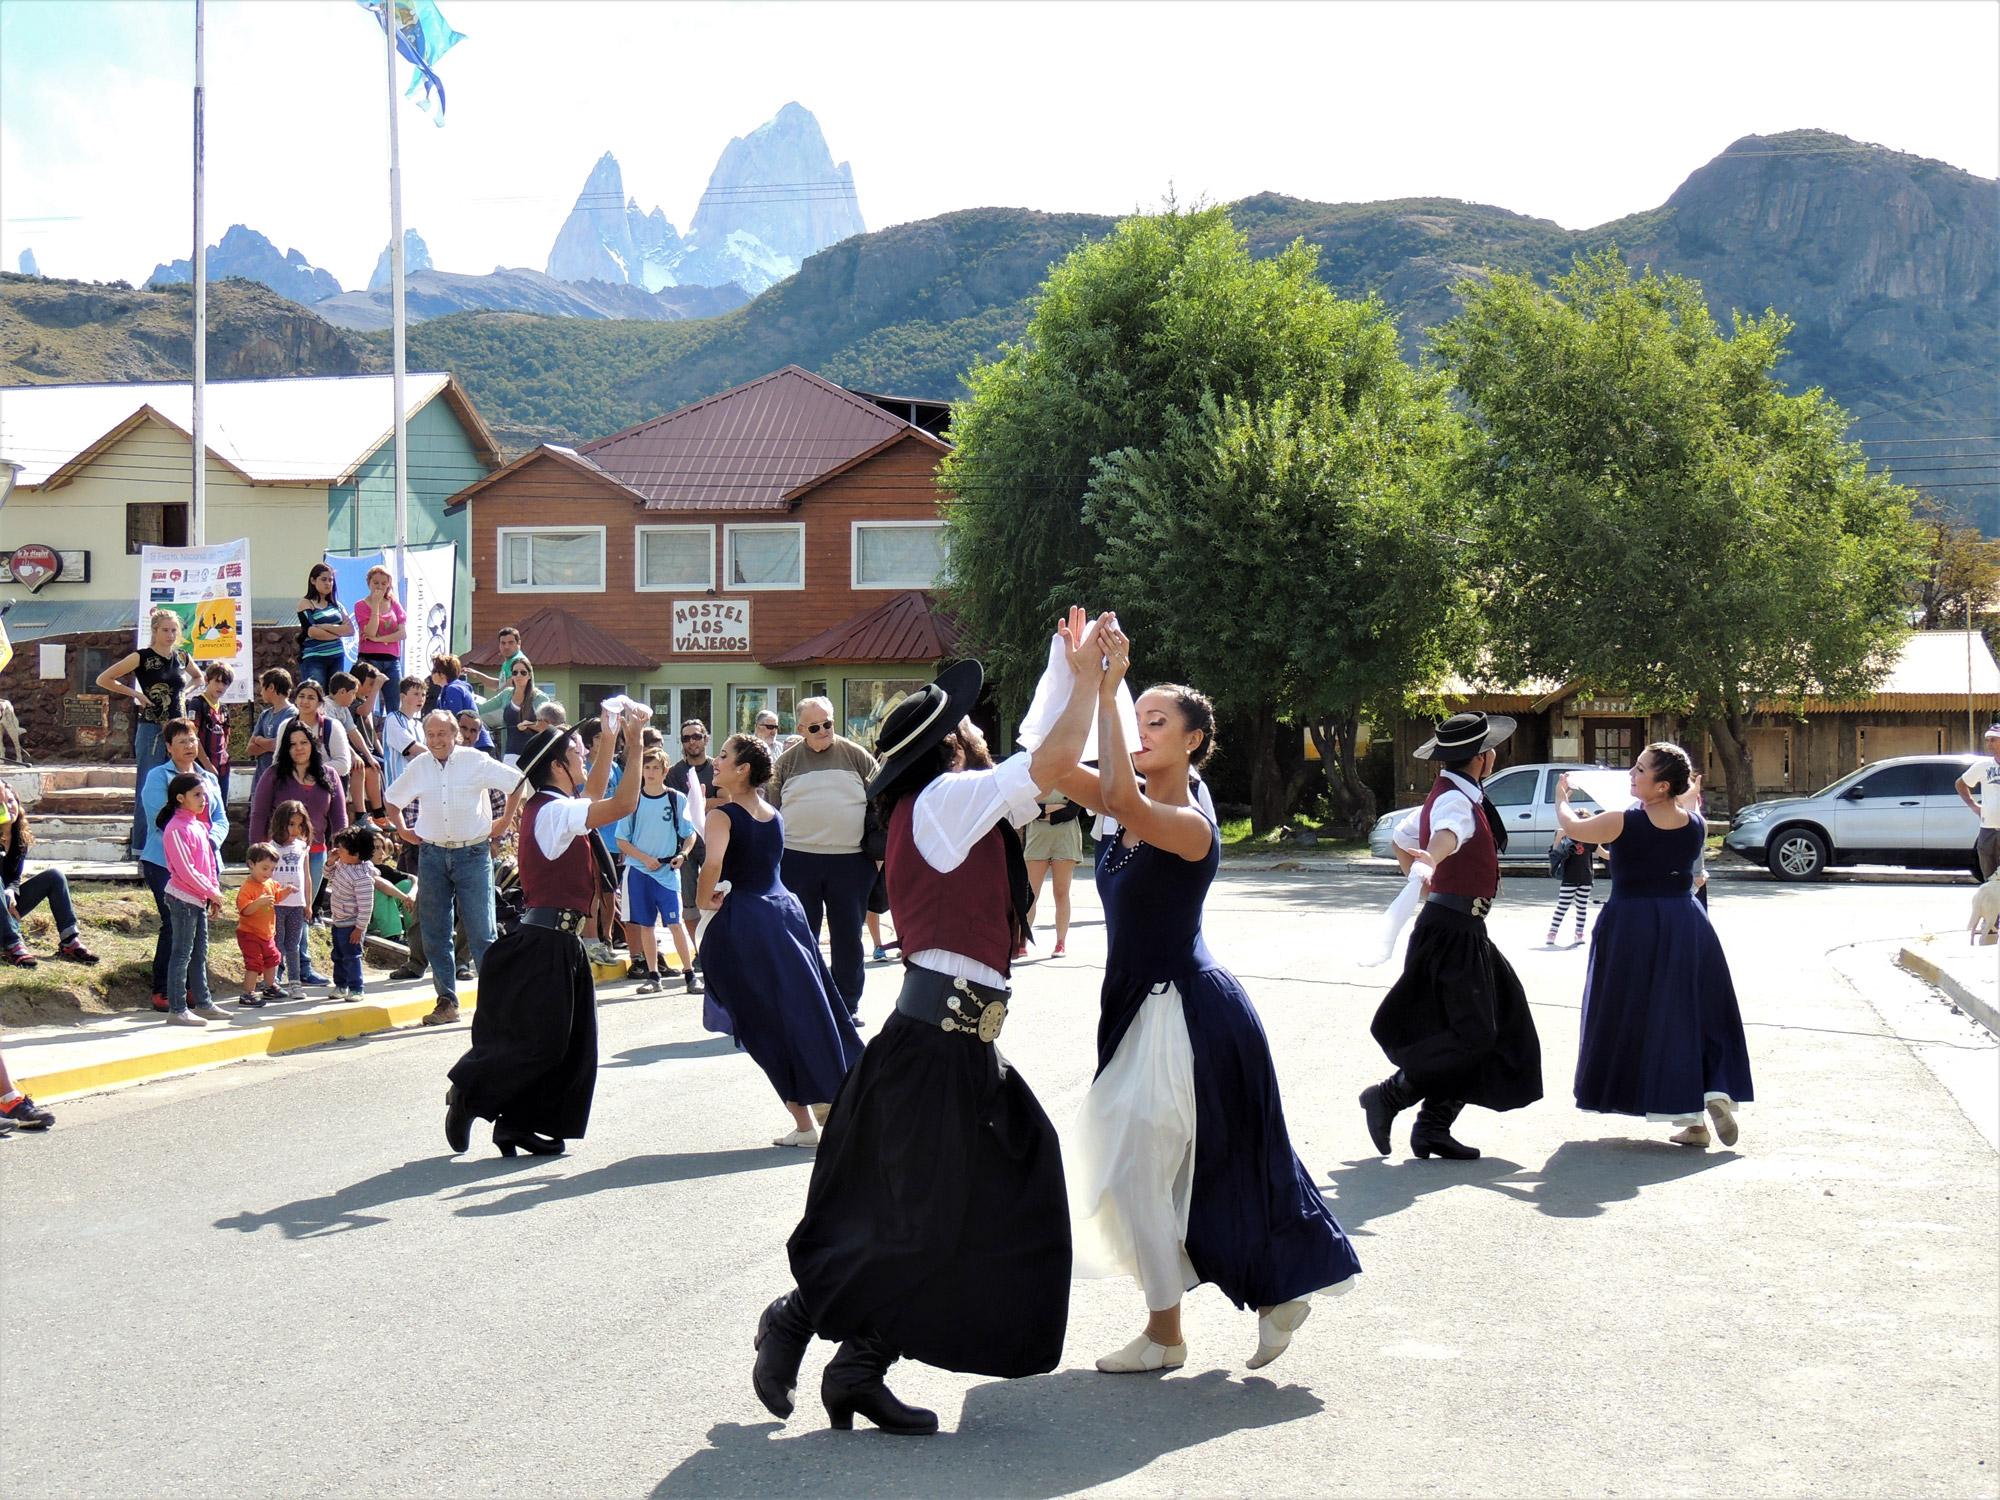 Michelle - Argentijnse dans in Patagonië, op de achtergrond de berg Fitz Roy